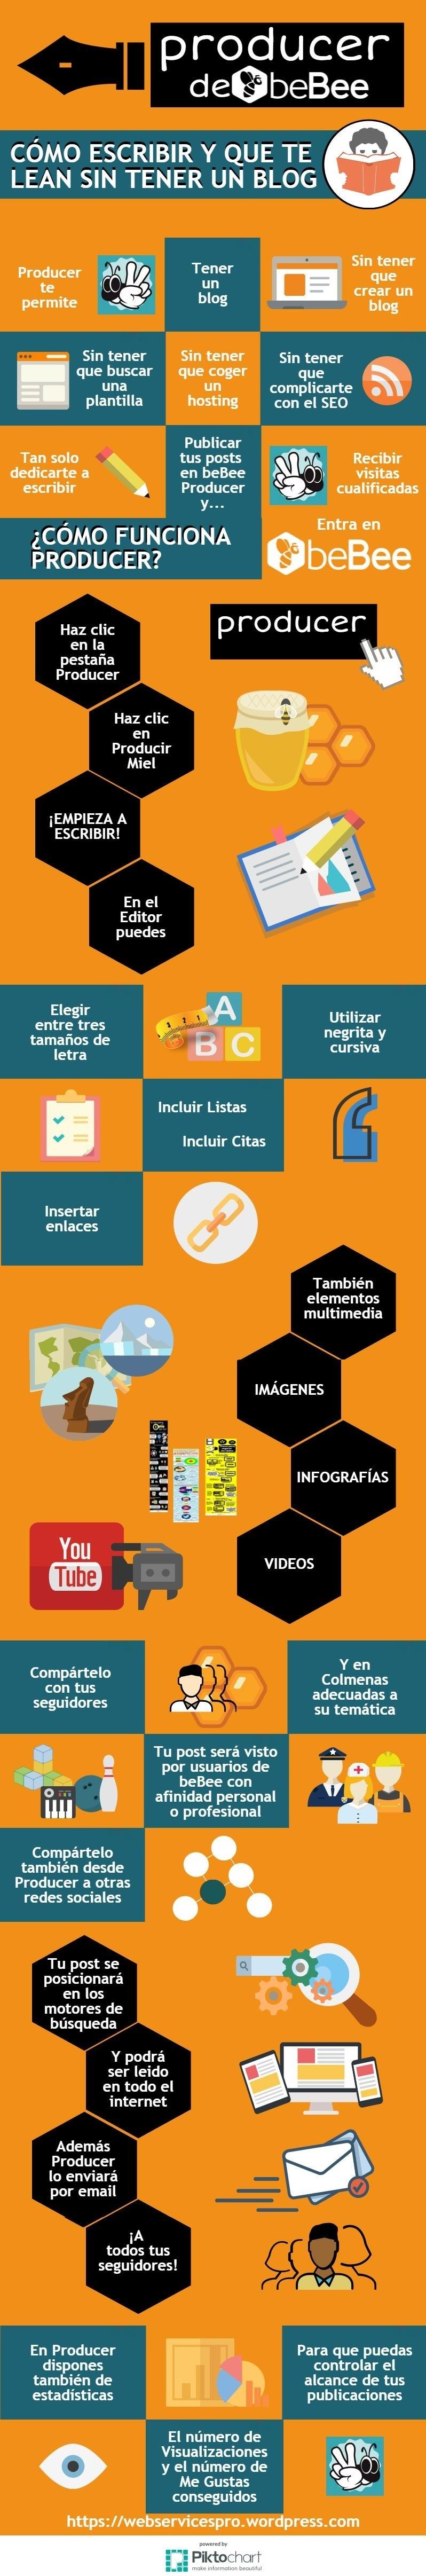 producer-bebee-infografia